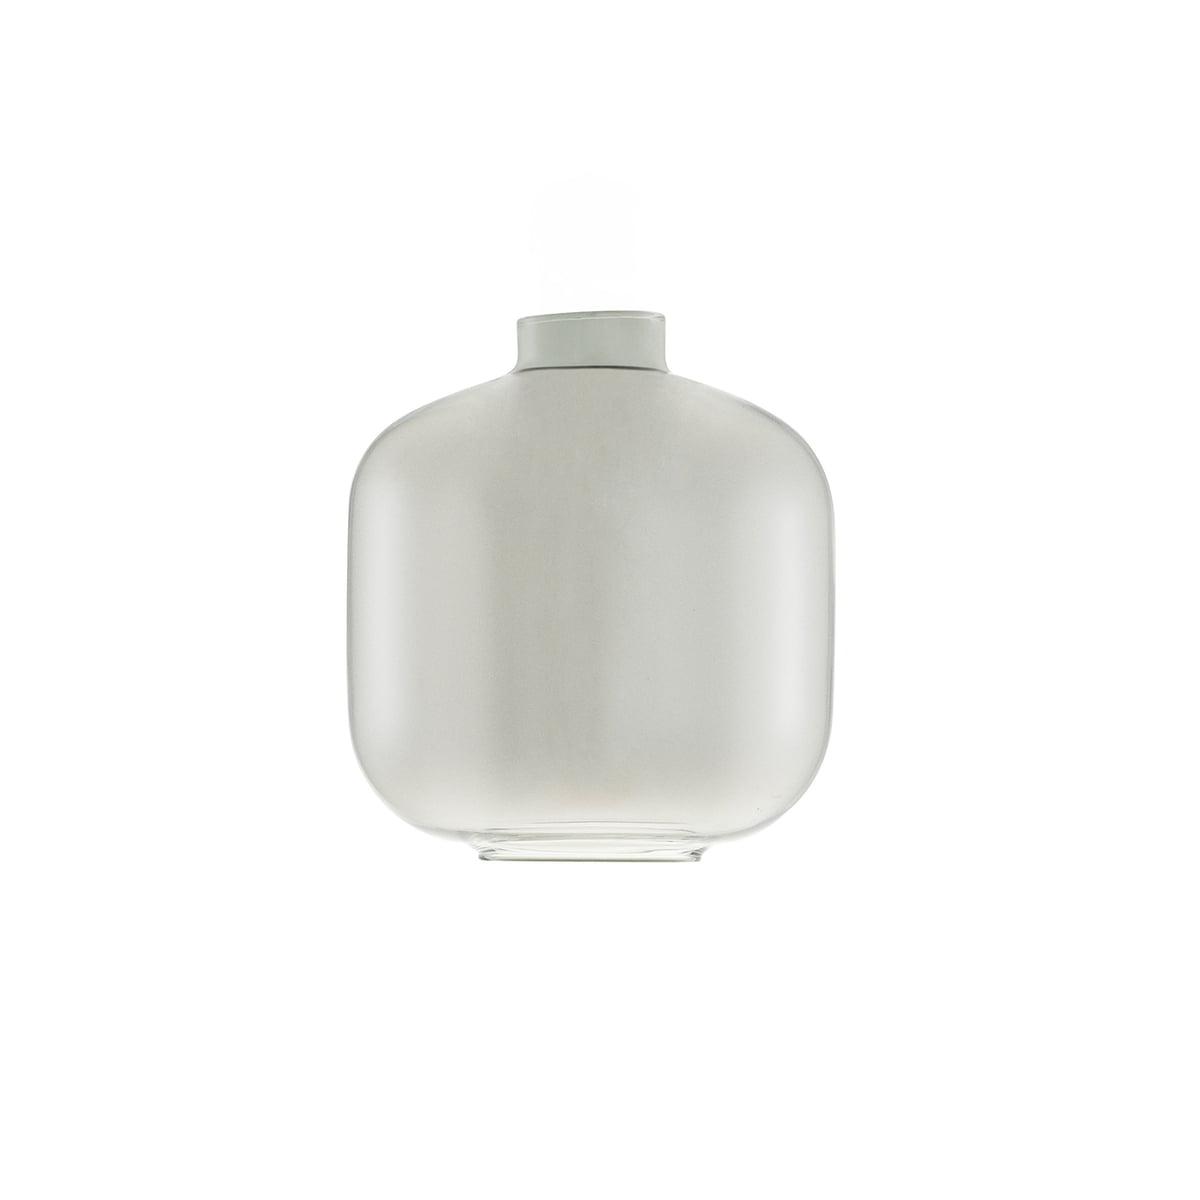 Normann Copenhagen - Replacement Glass for Amp Pendant Lamp small, smoke